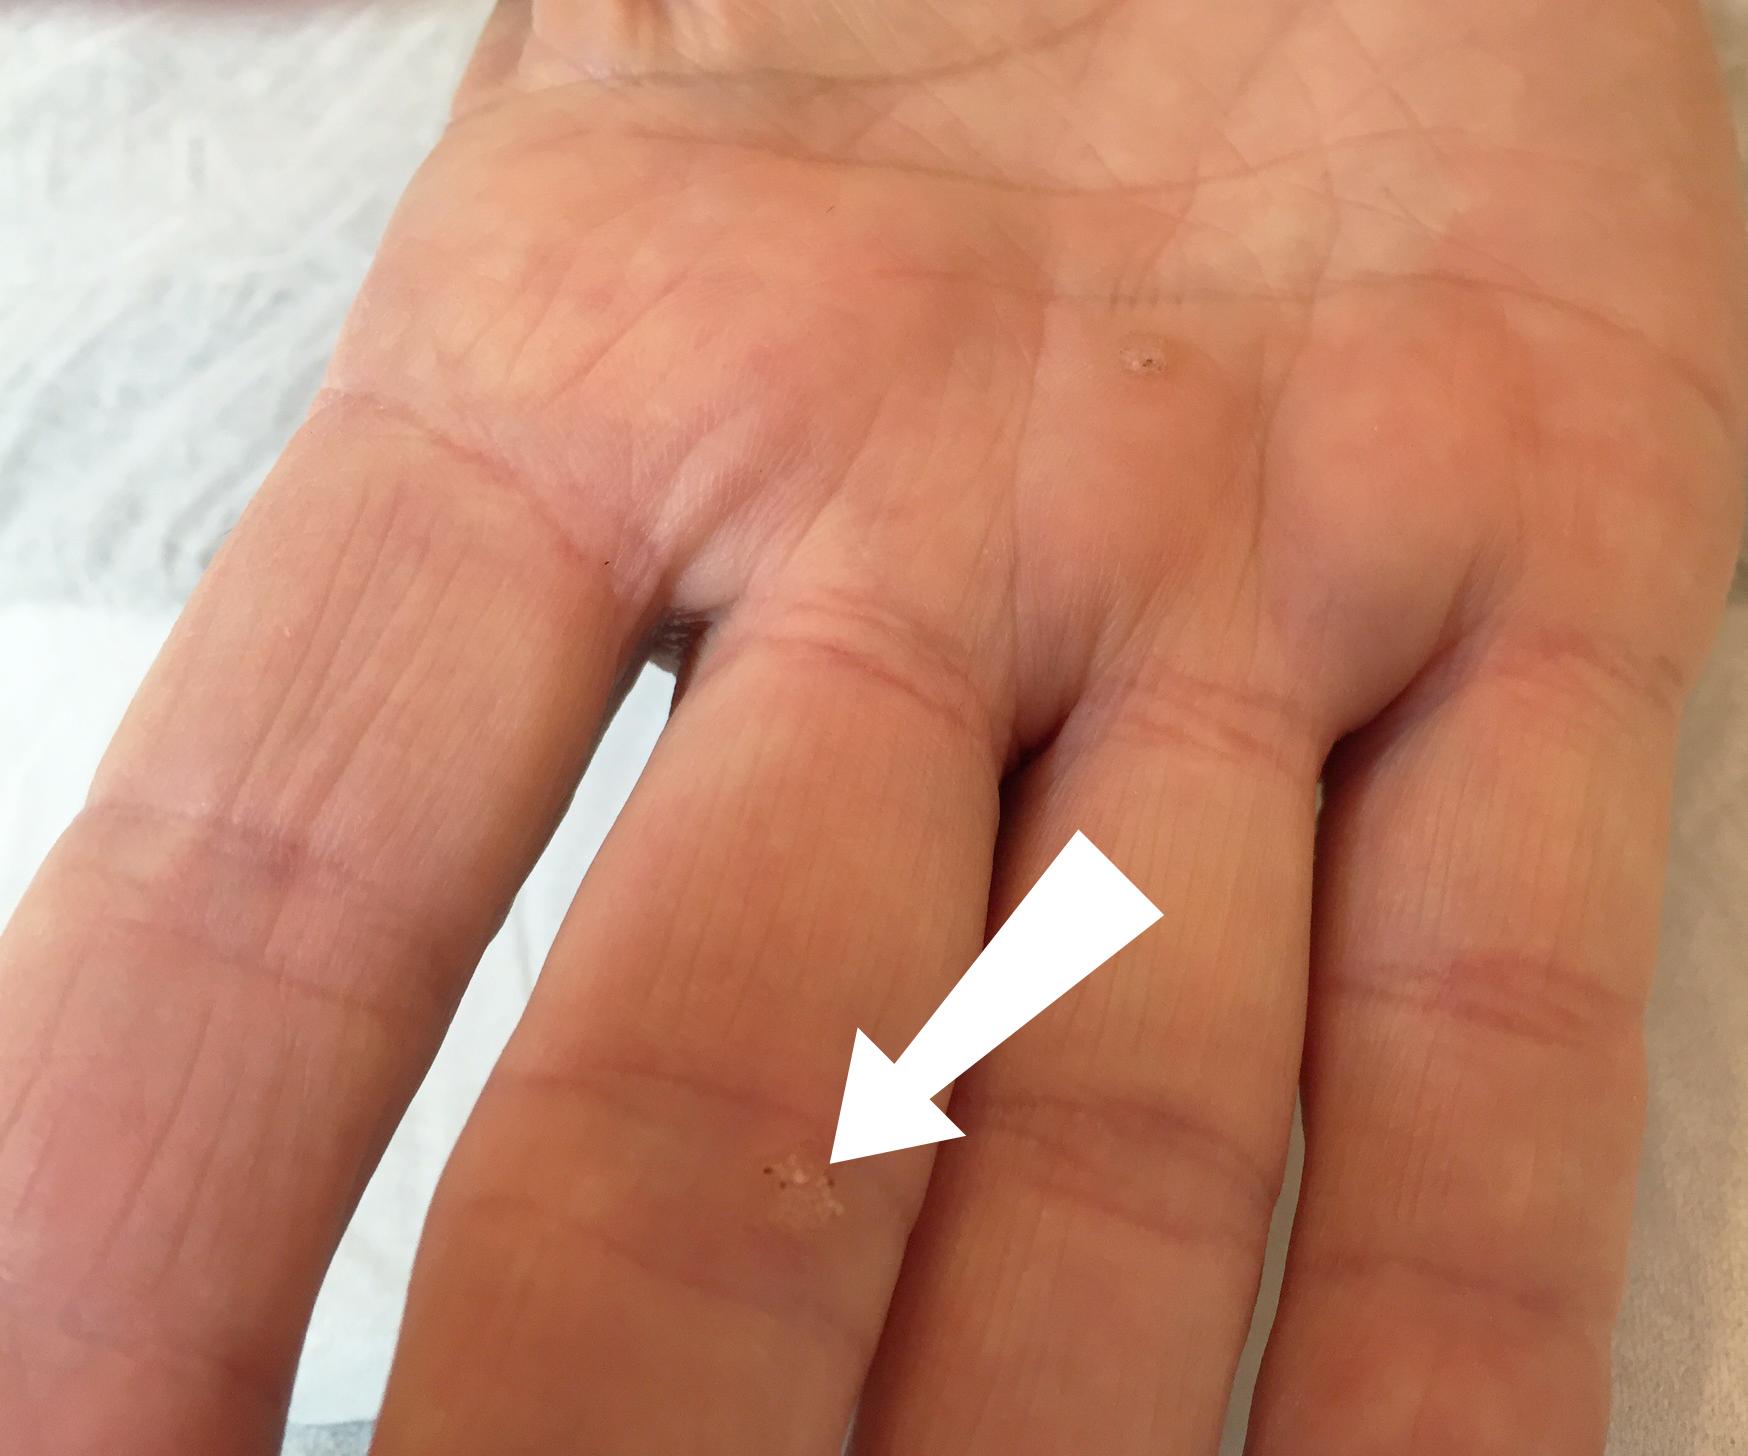 warts on hands and feet during pregnancy deparazitare la grădiniță